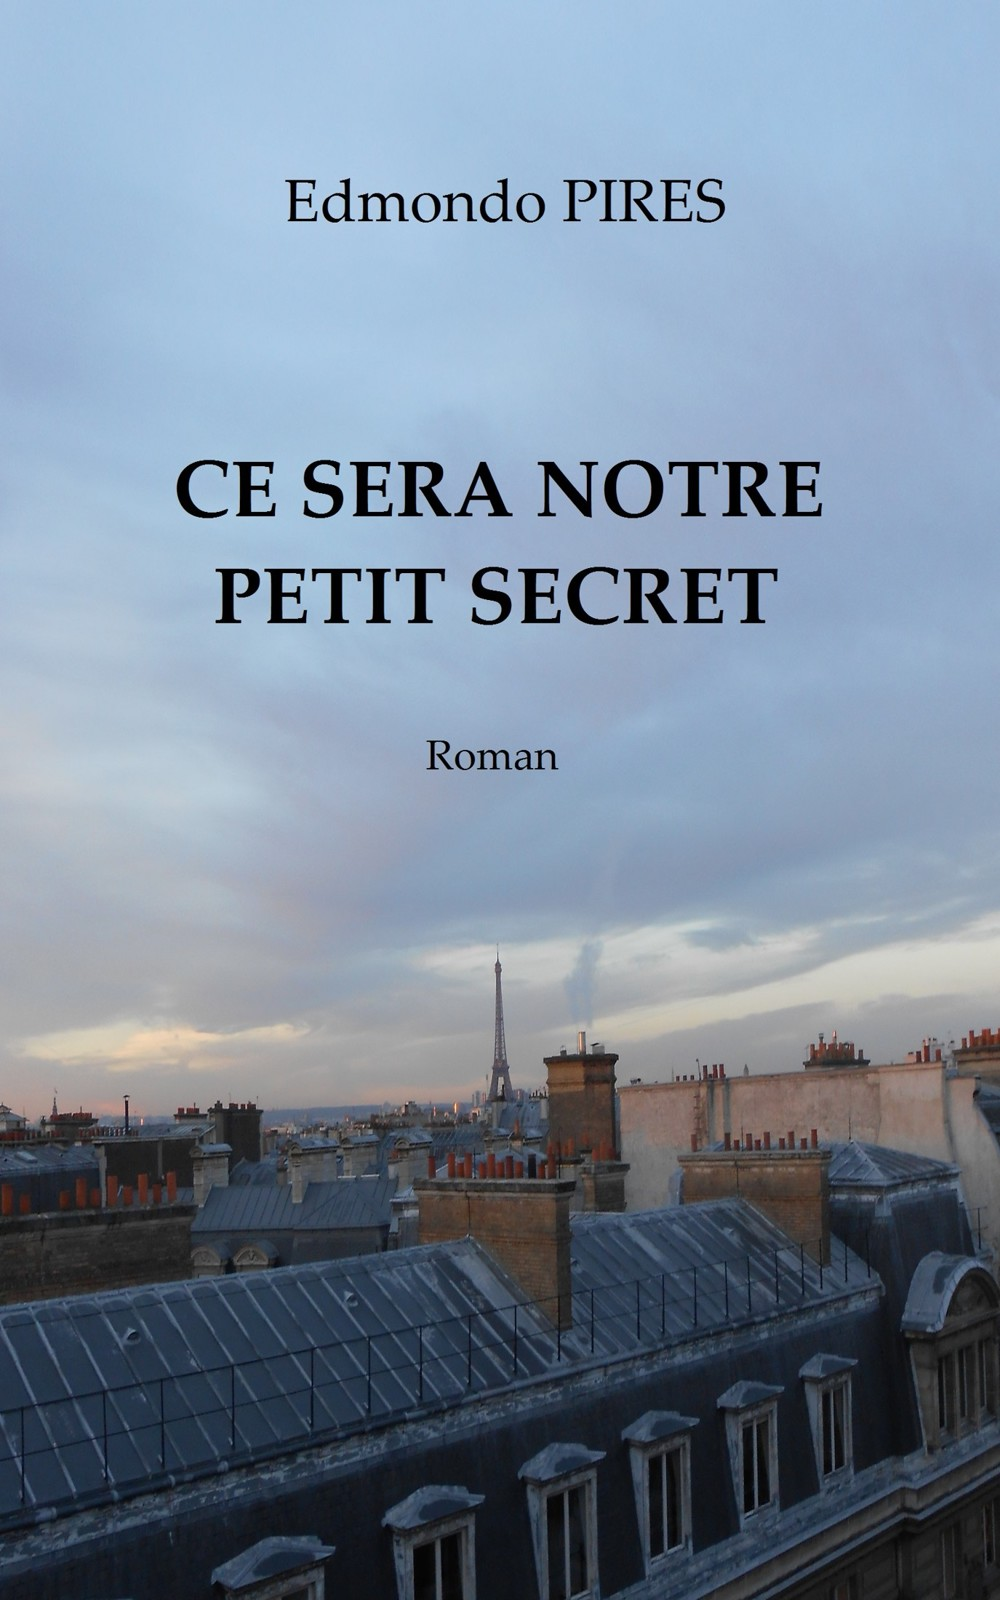 Edmondo Pires - Ce sera notre petit secret